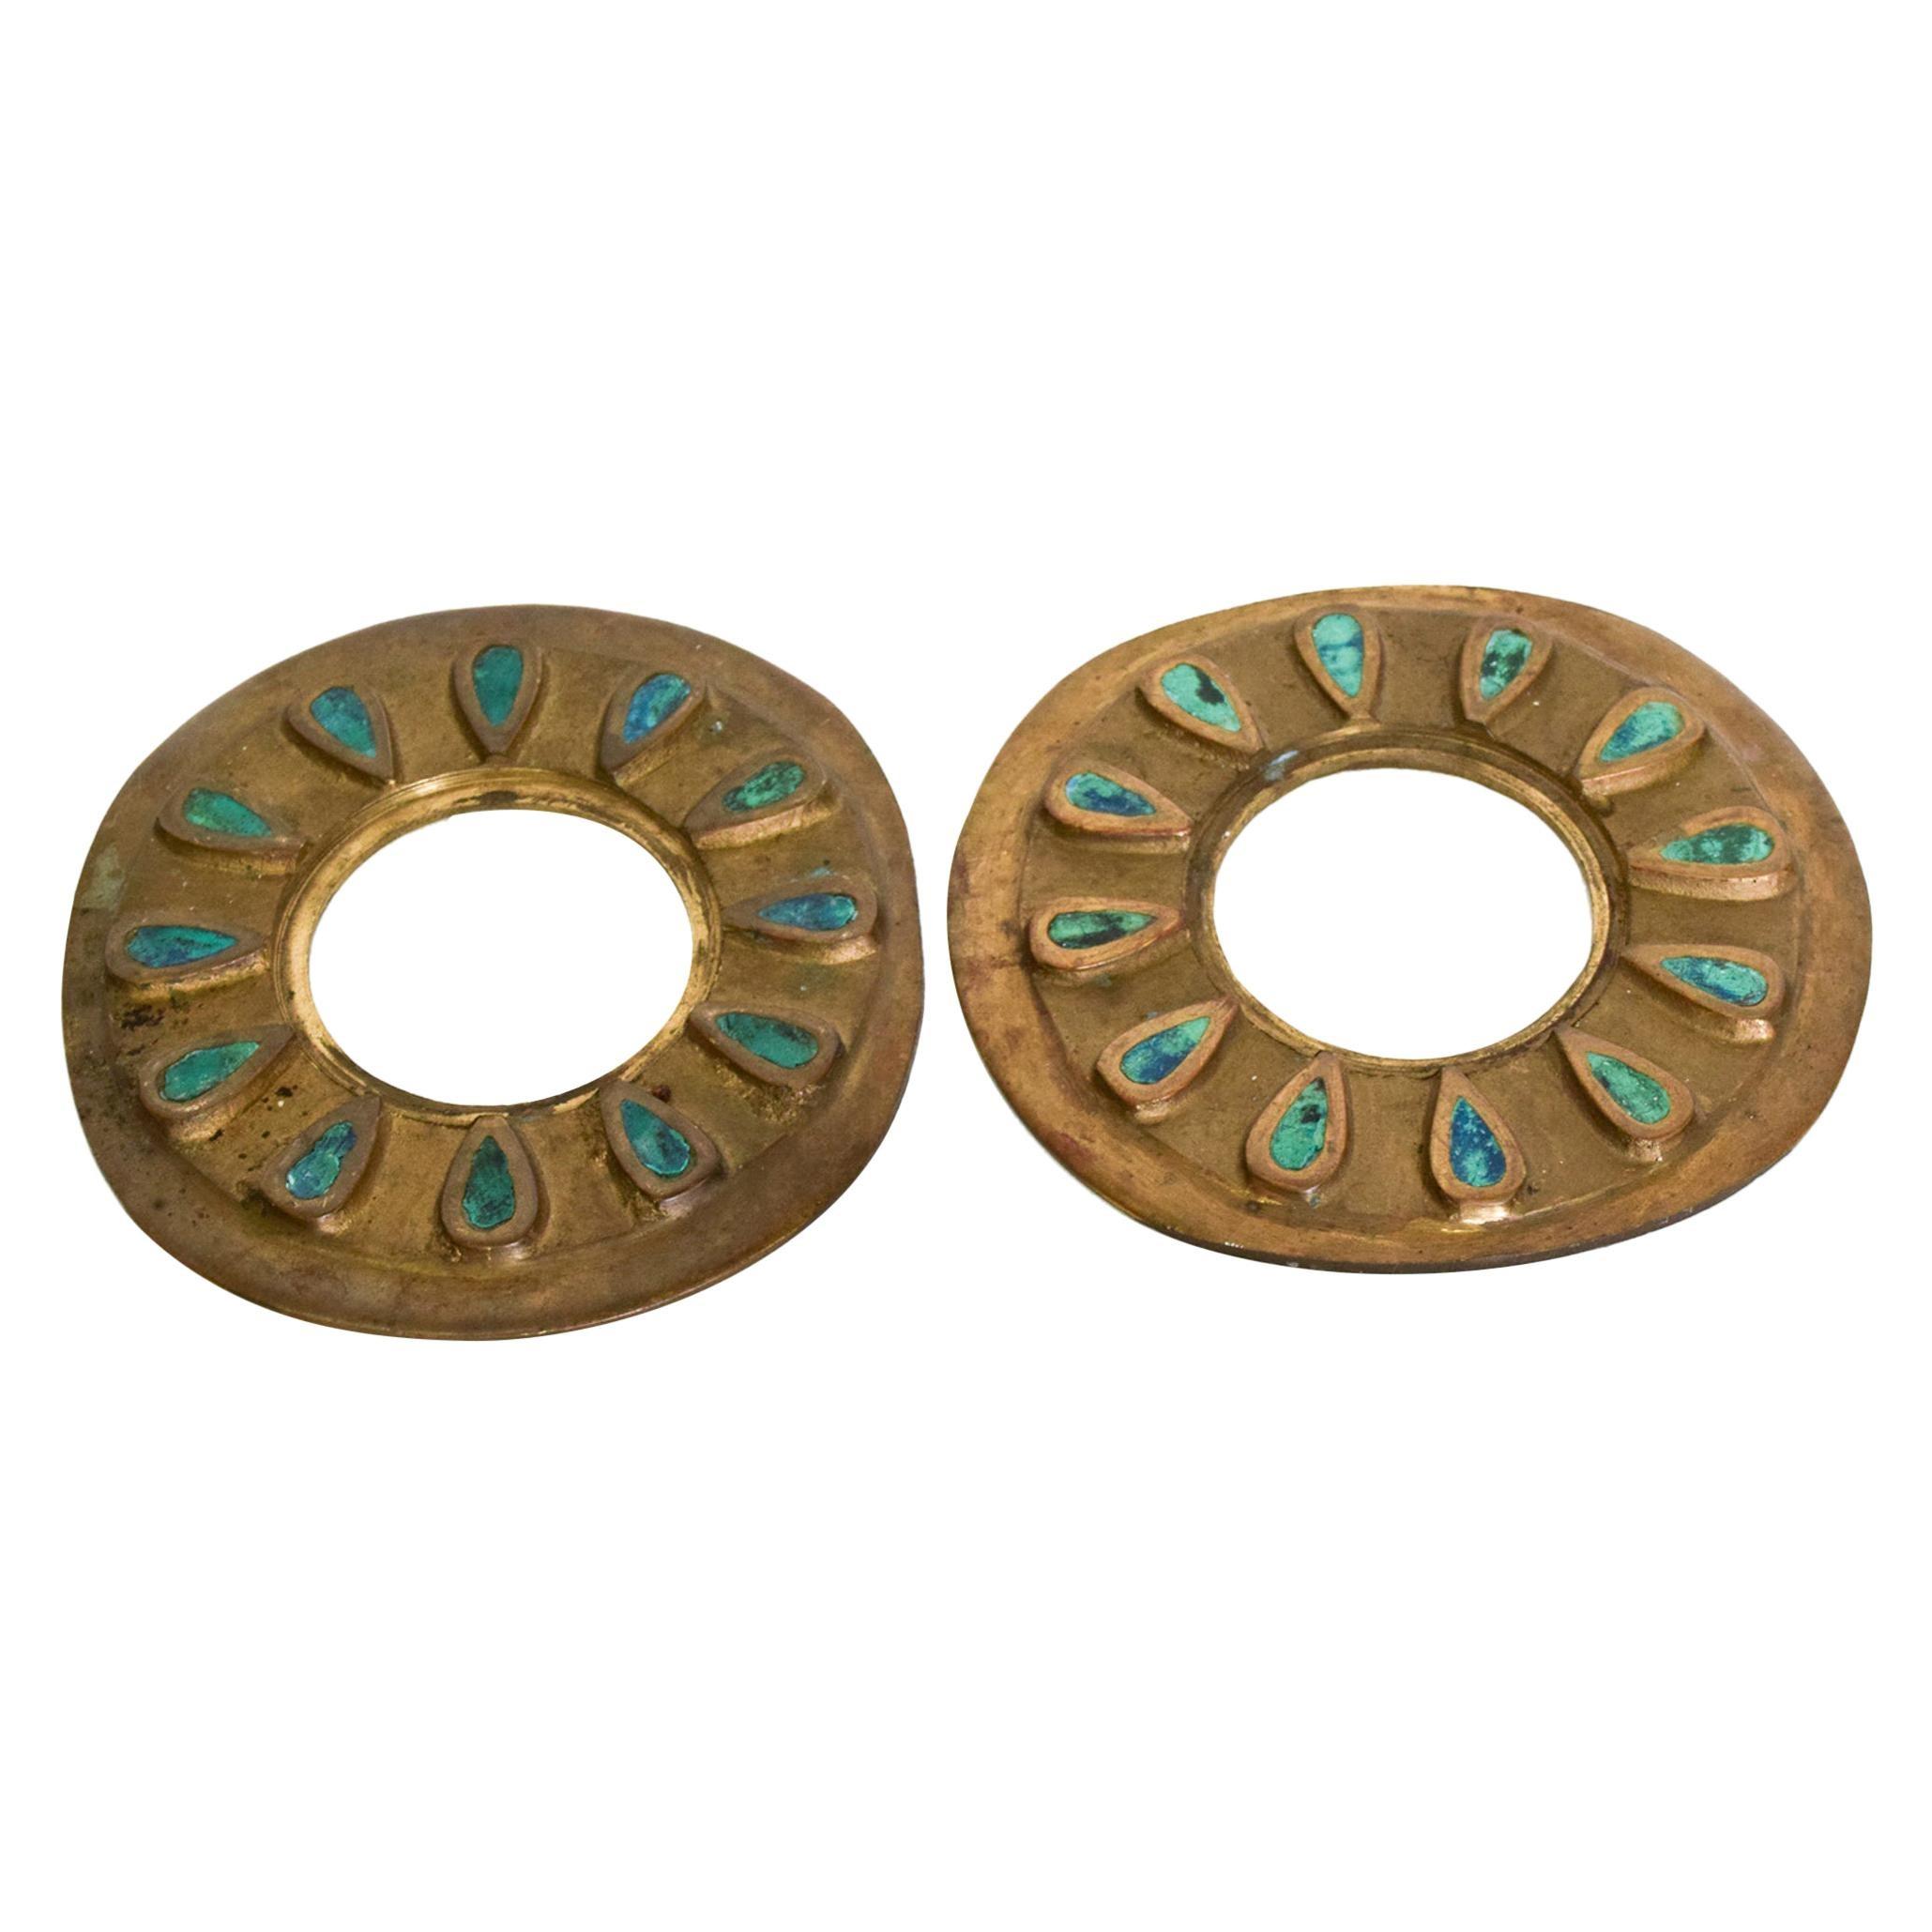 Pepe Mendoza Cloisonné Round Door Knob Ring Plate Malachite & Bronze 1958 Mexico